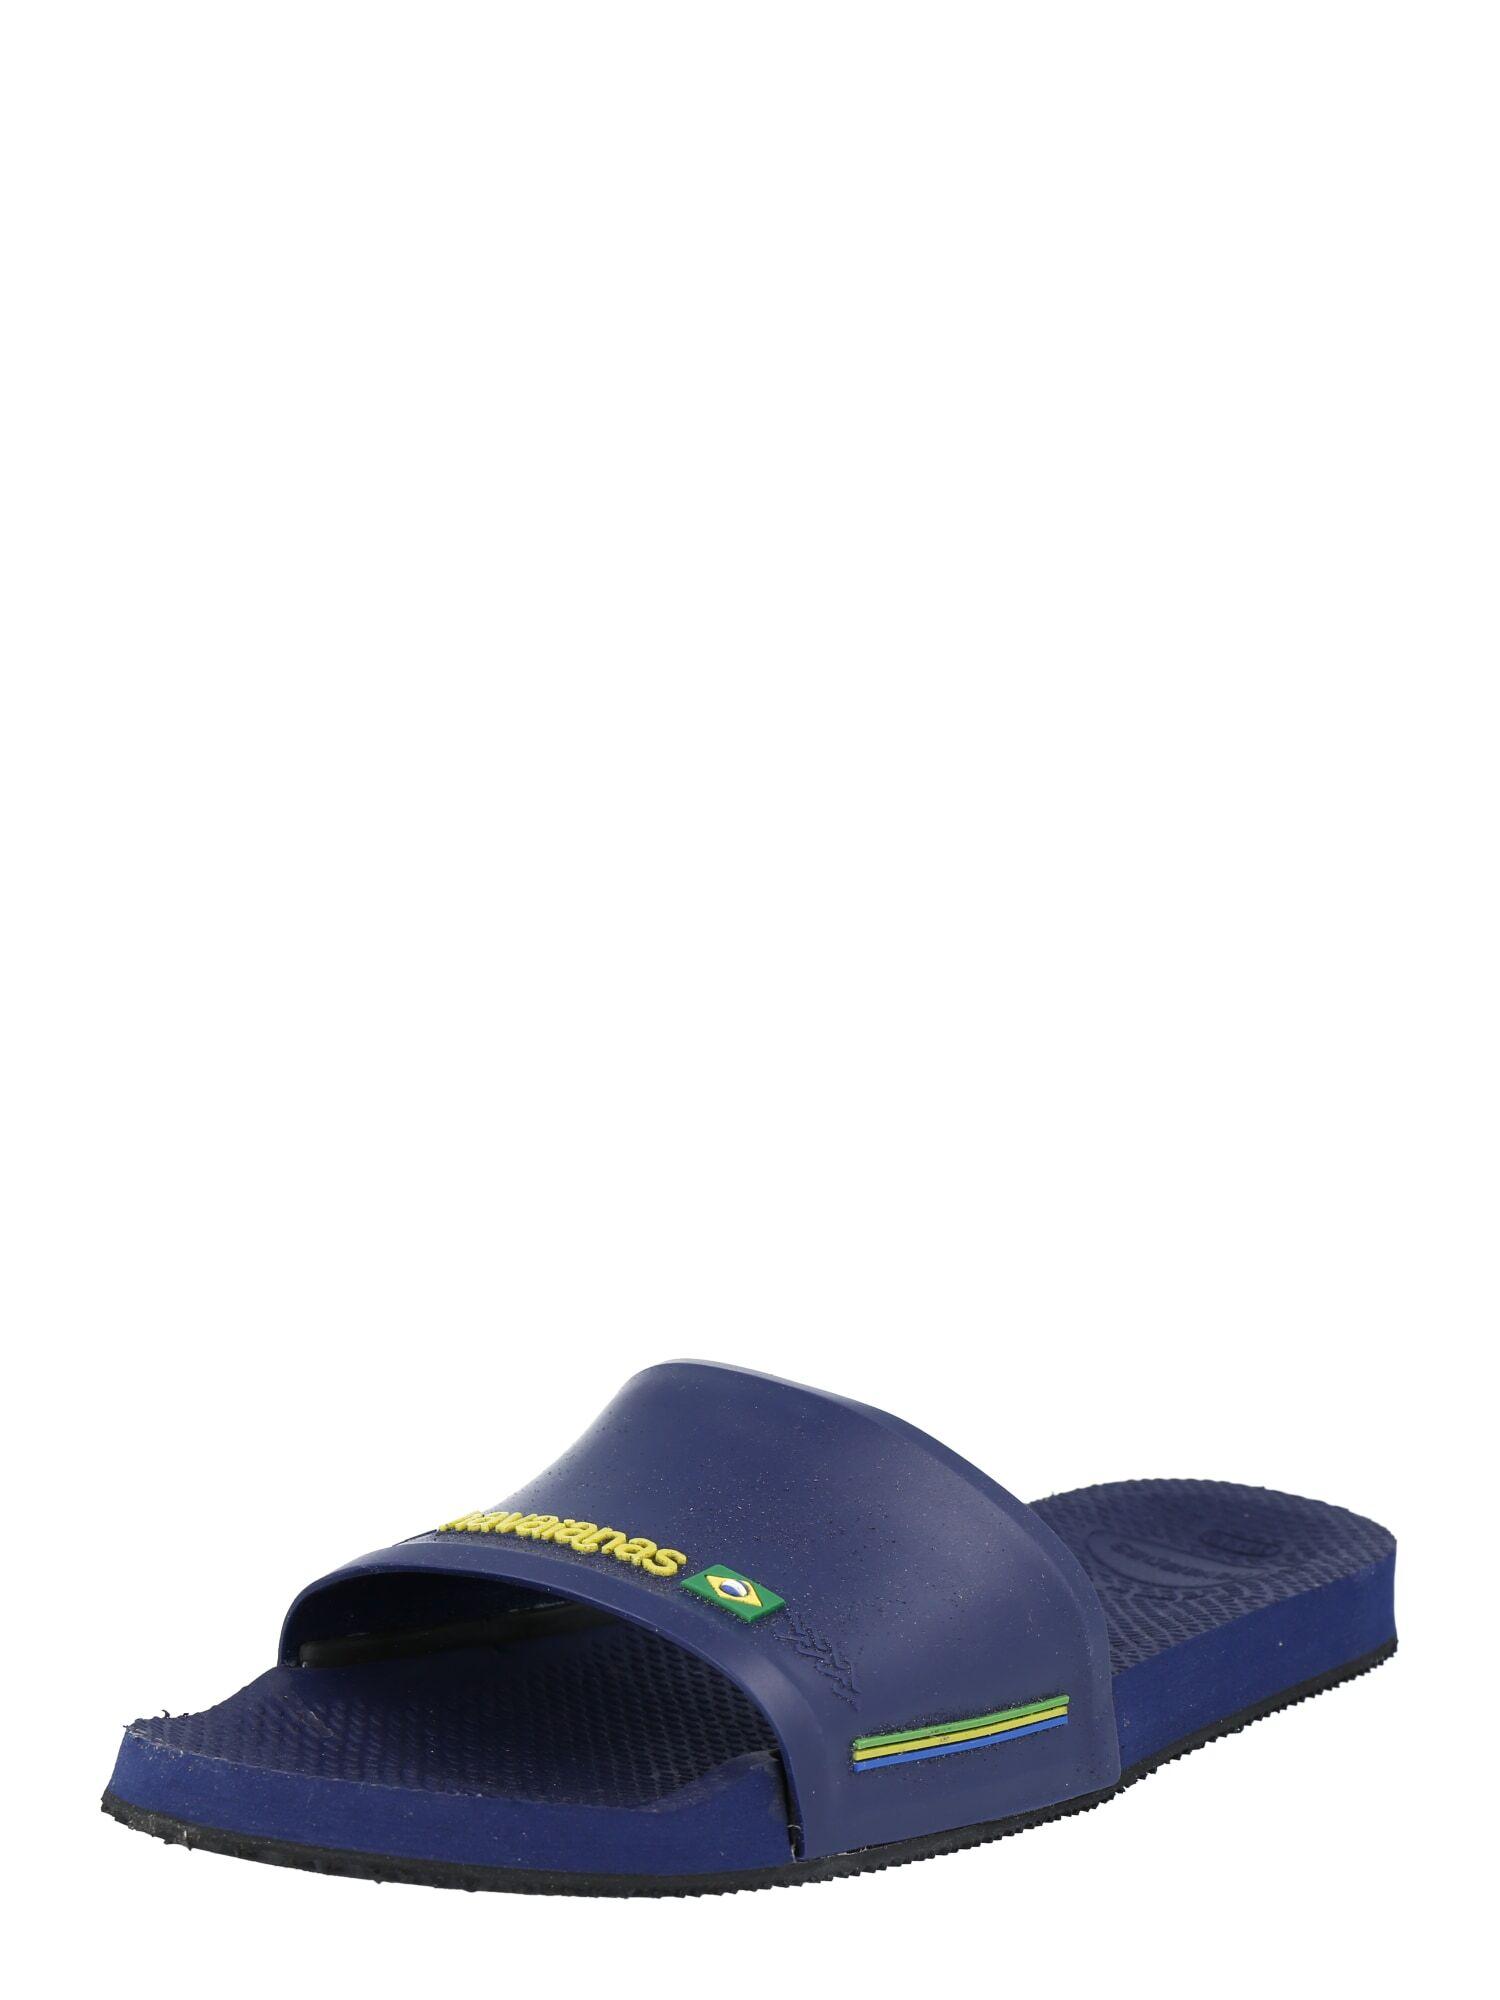 HAVAIANAS Mule 'Slide Brasil'  - Bleu - Taille: 37-38 - female